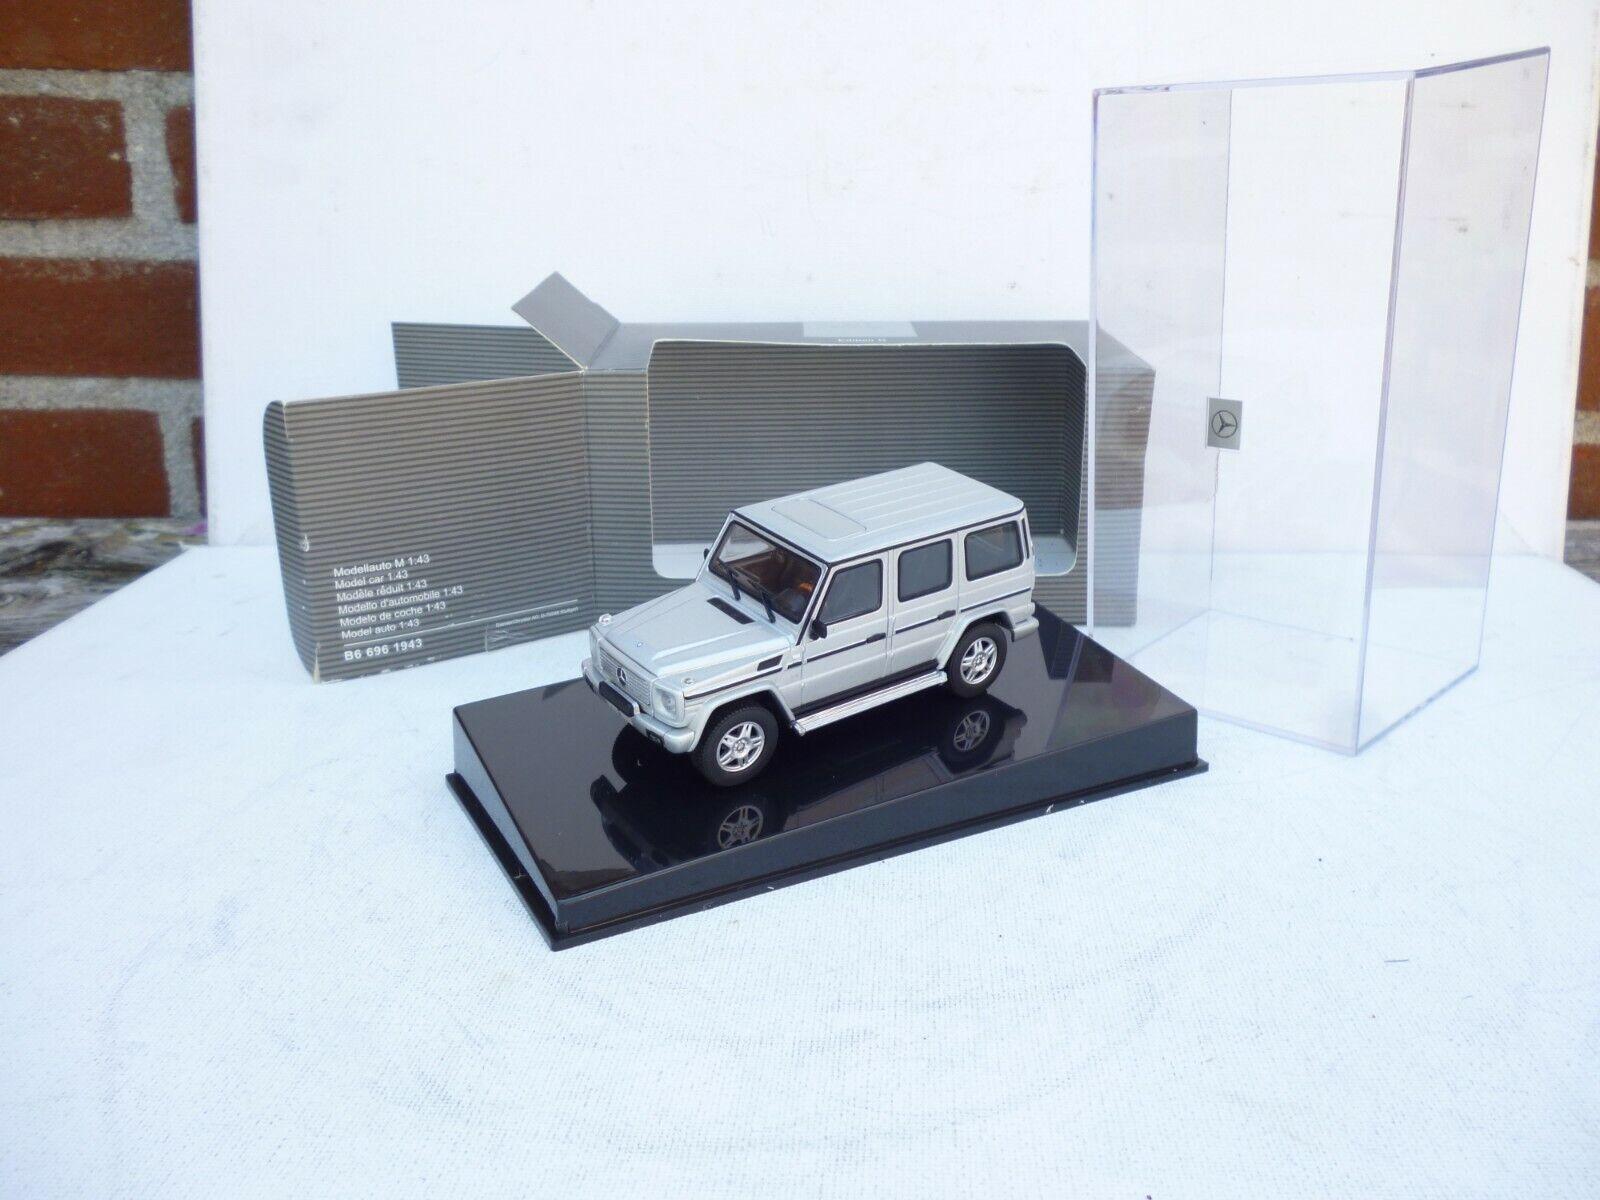 Mercedes Benz G Klasse Street Version Metallic silver 1 43 Minichamps  NEW ovp